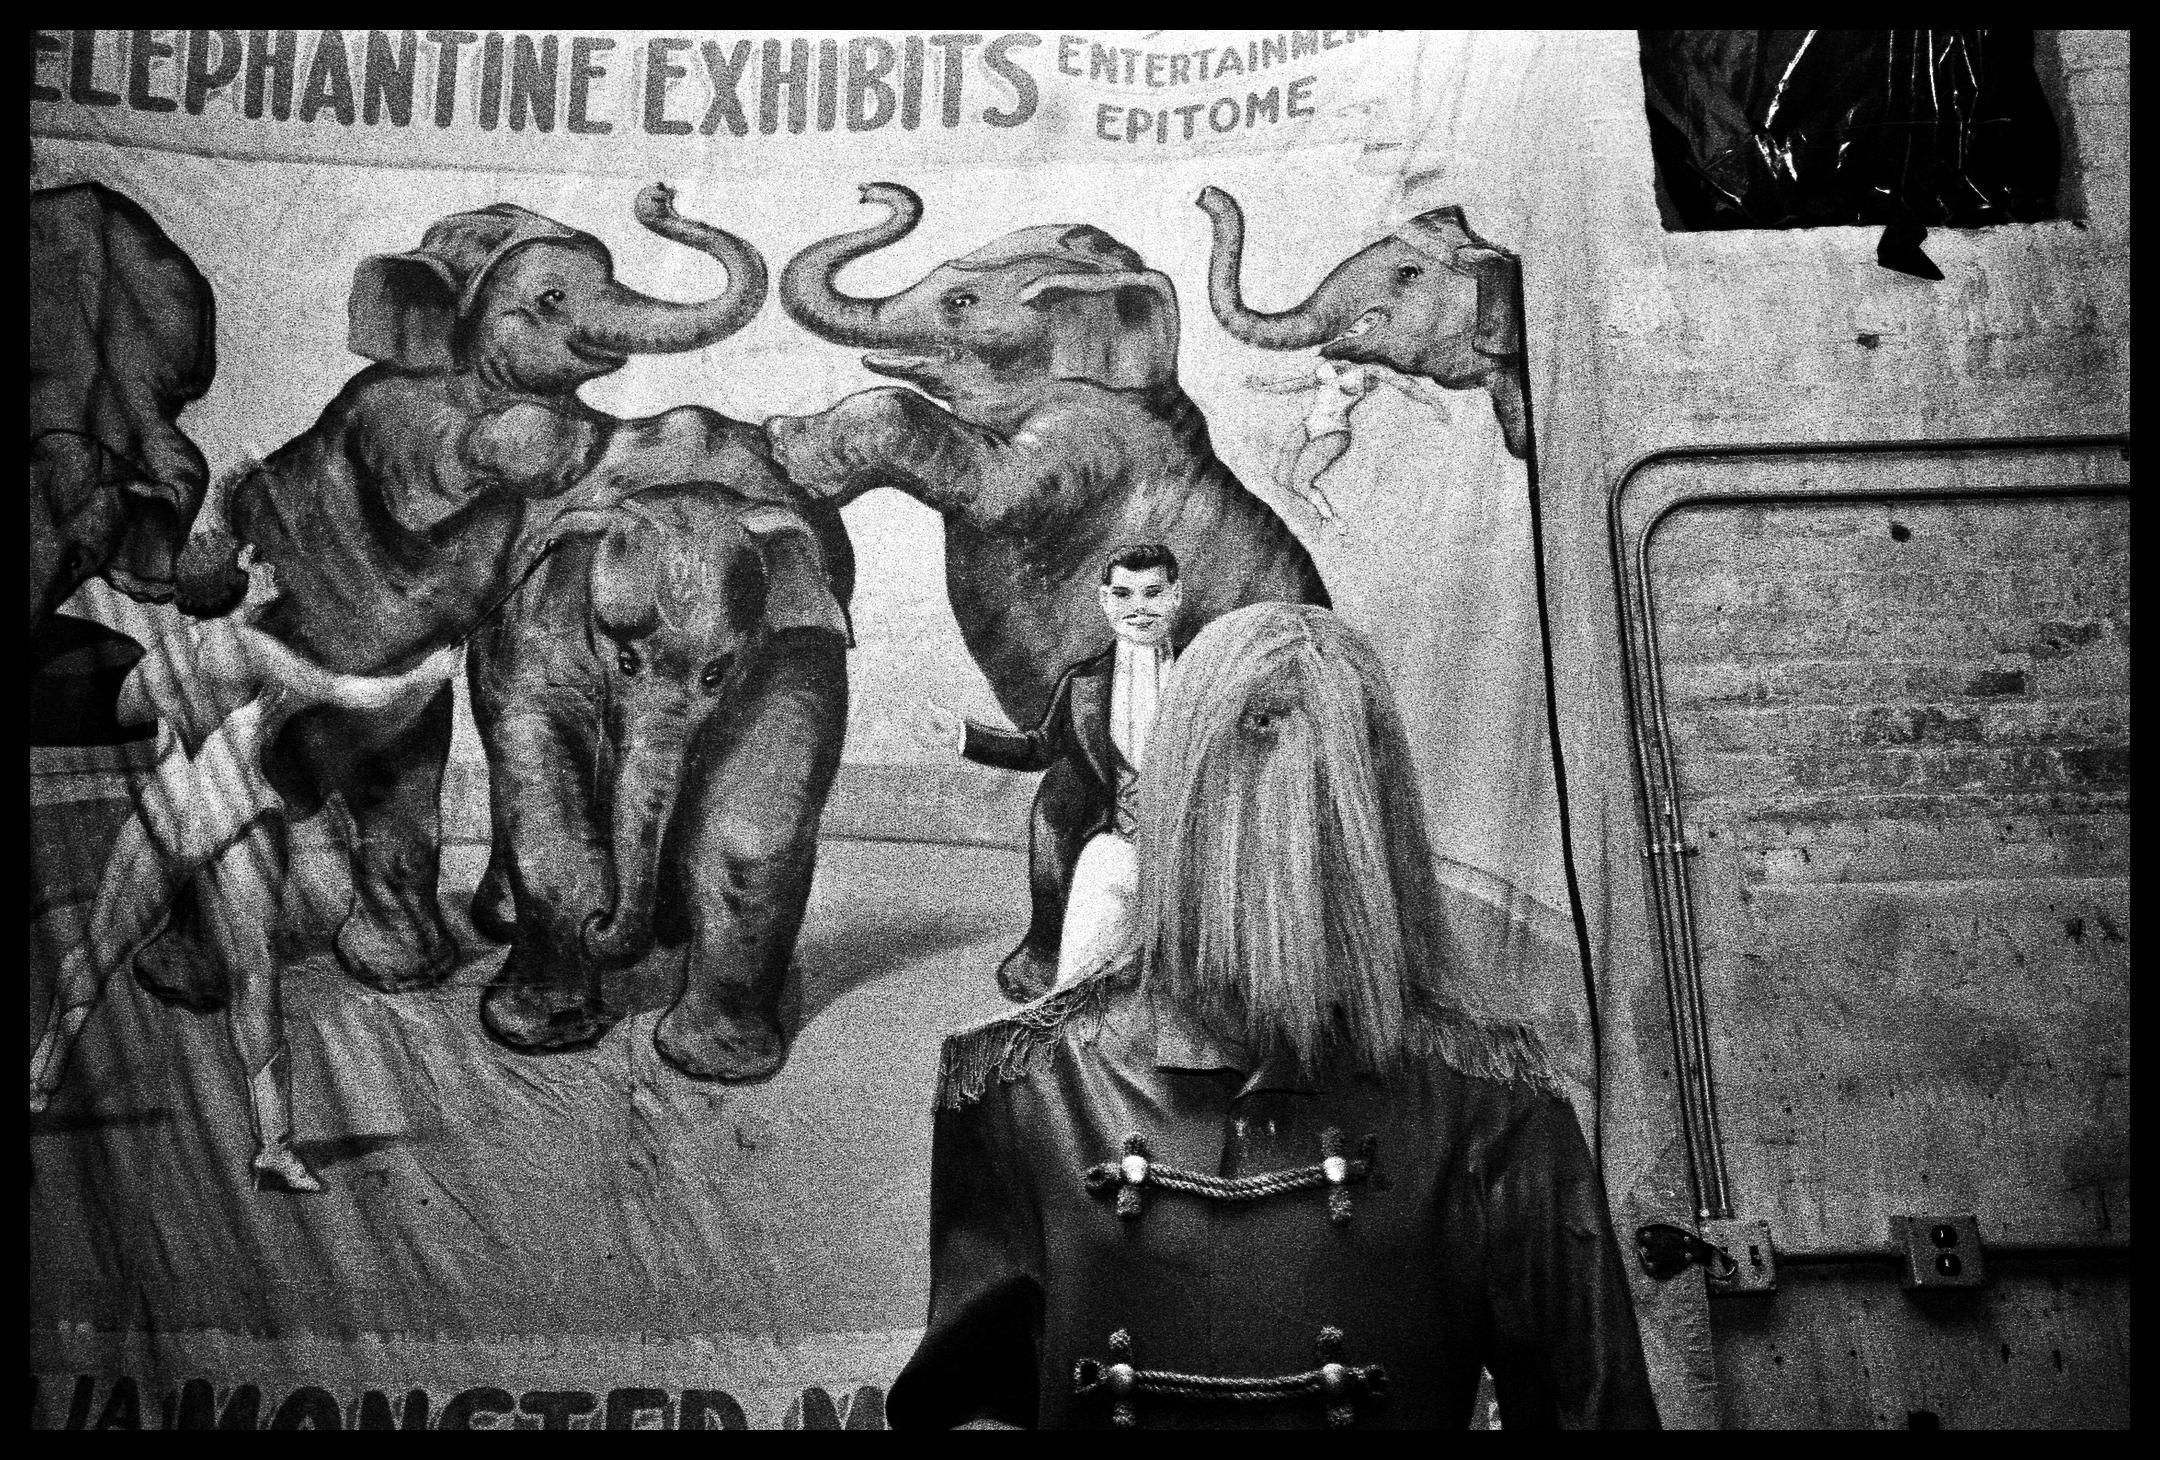 Circus World Museum, Baraboo WI, 2006